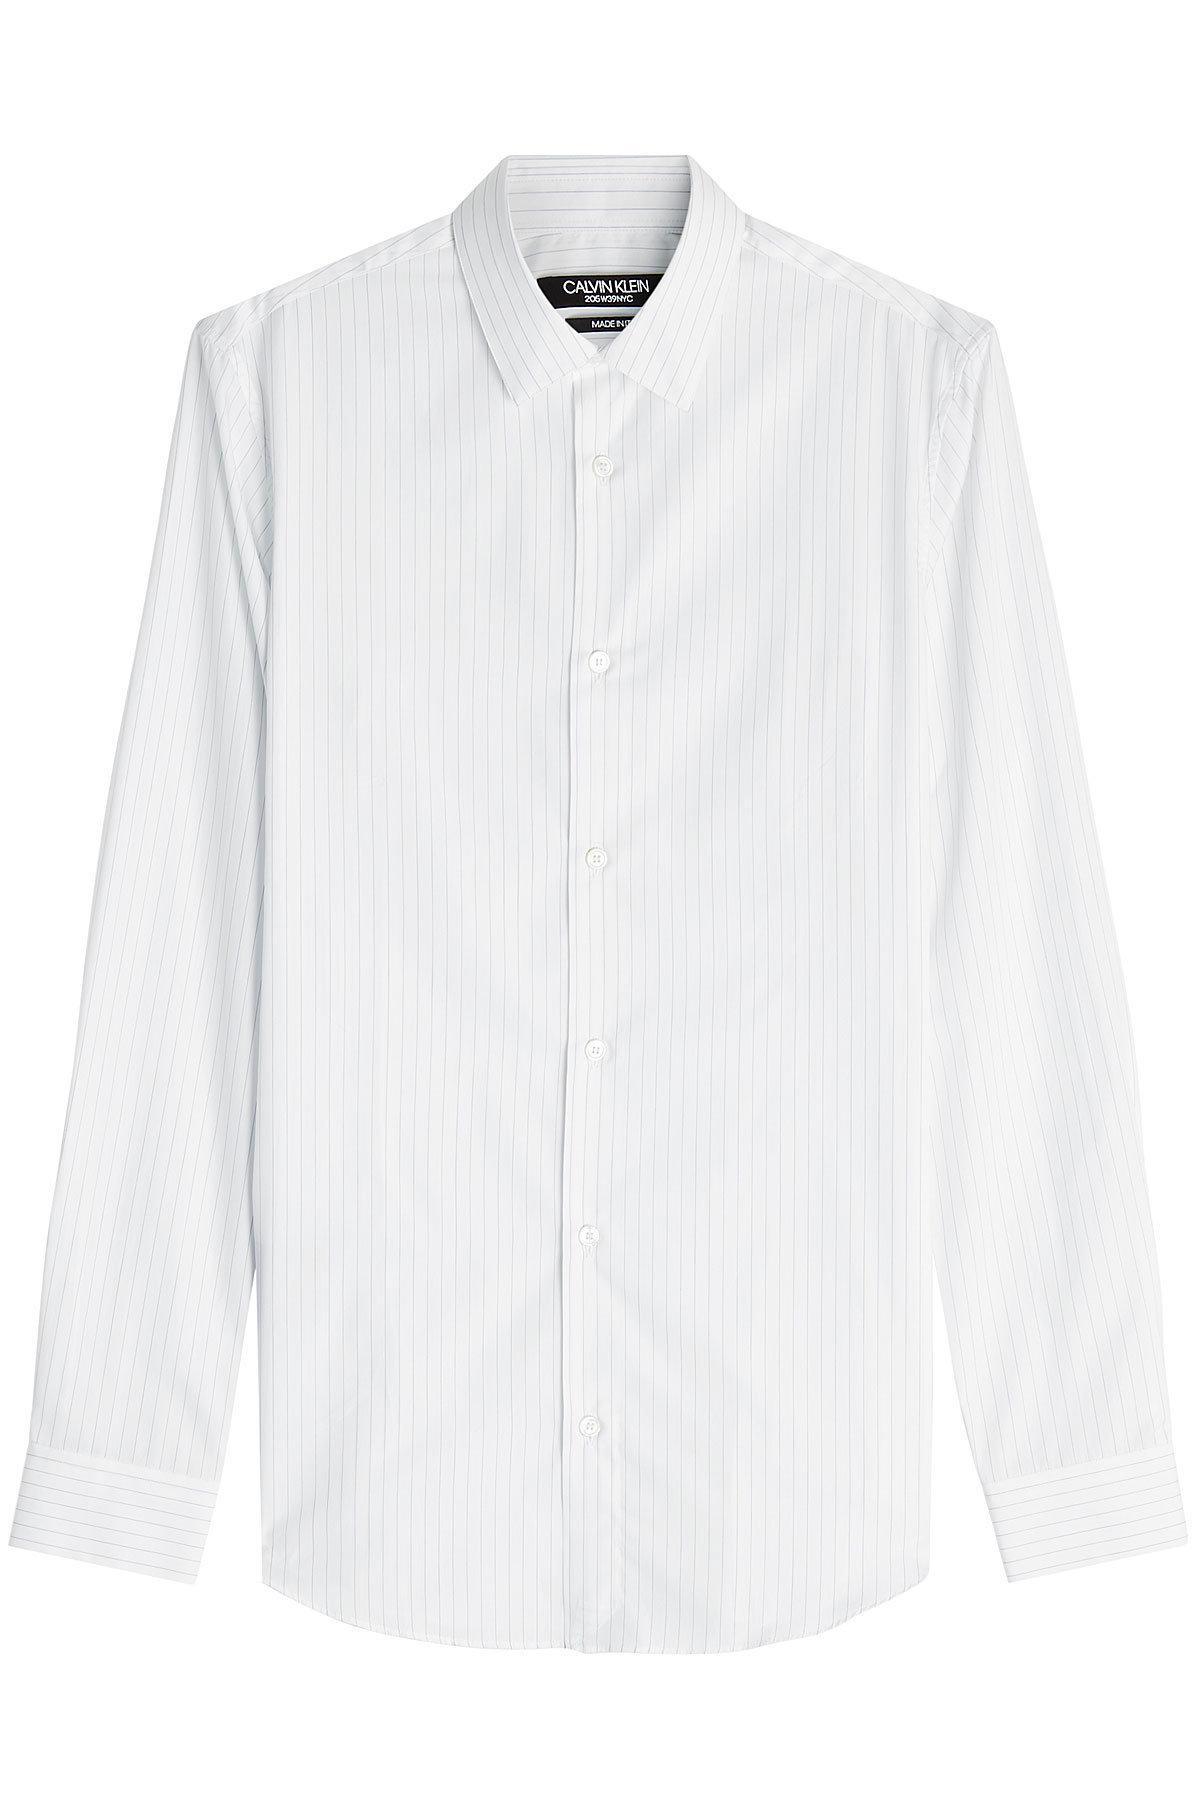 Calvin Klein 205W39Nyc Striped Cotton Shirt In White